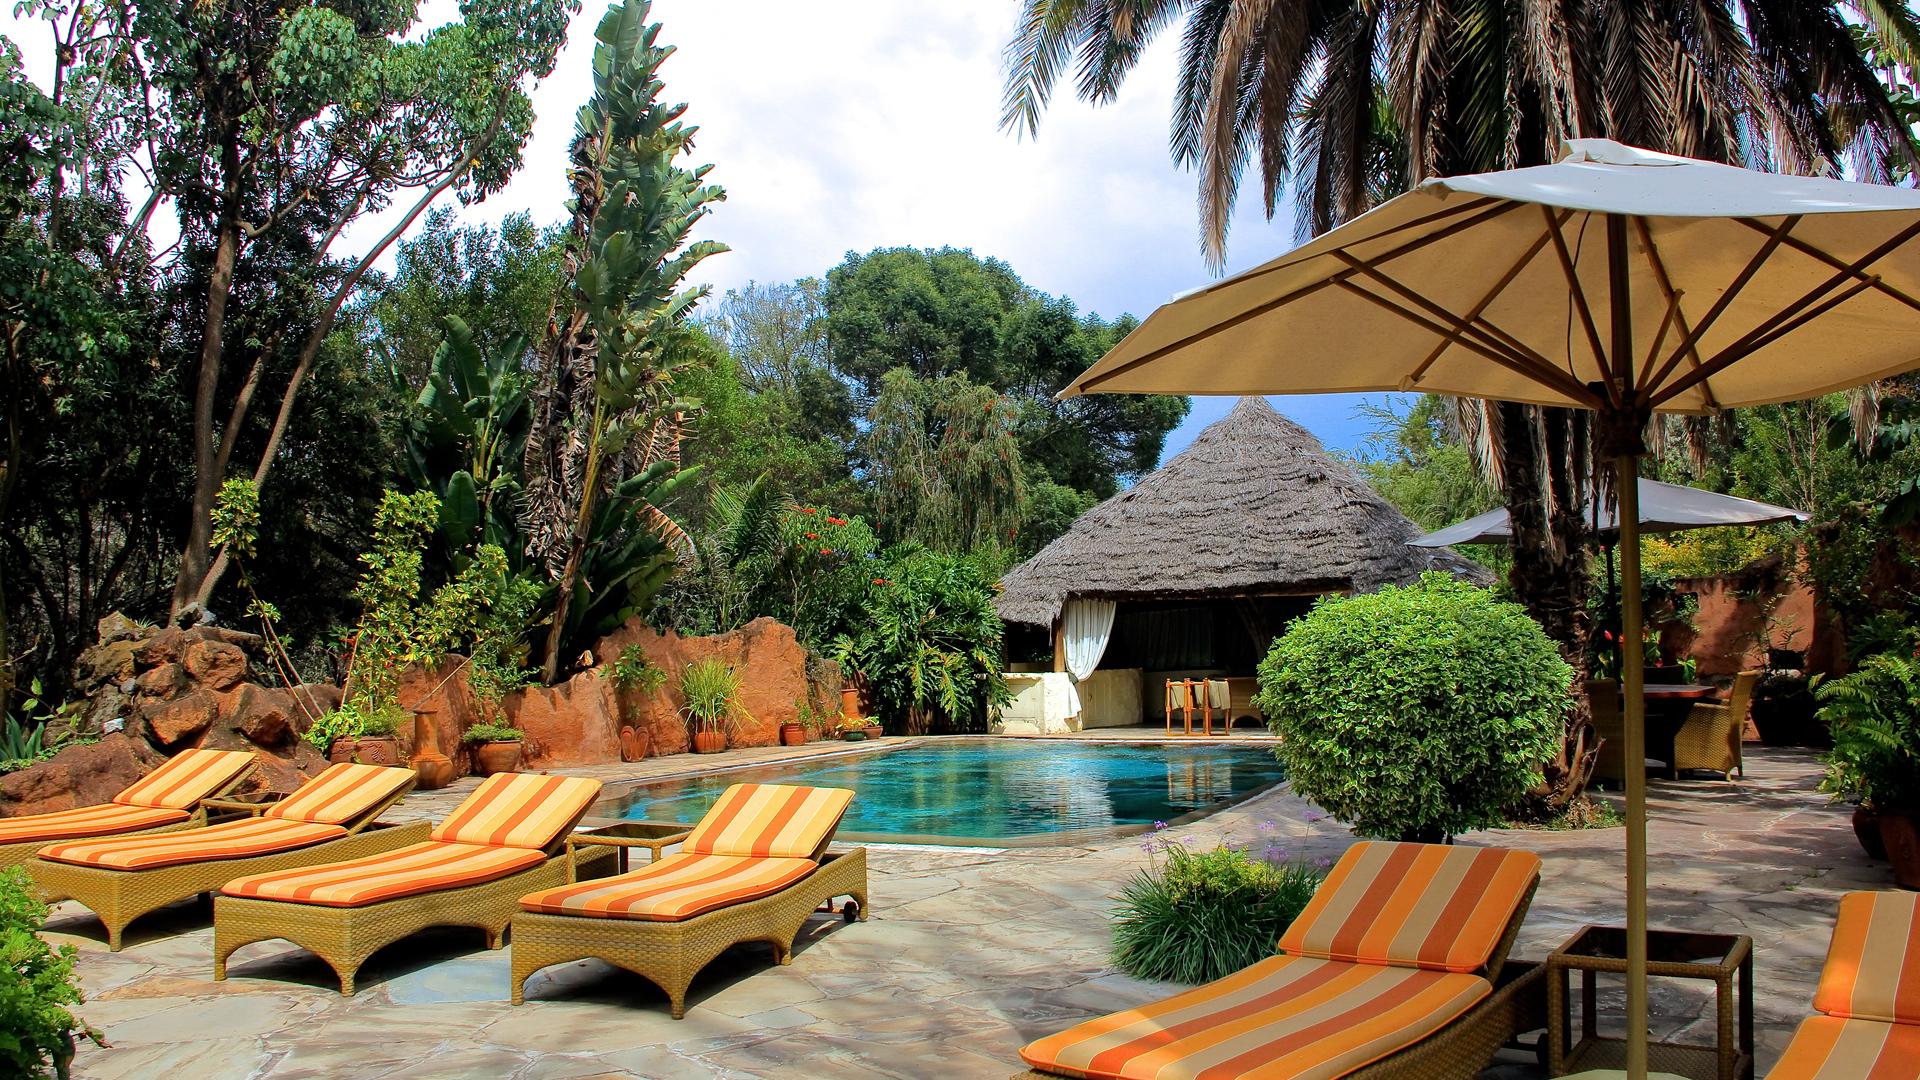 masai mara- mara chui resort